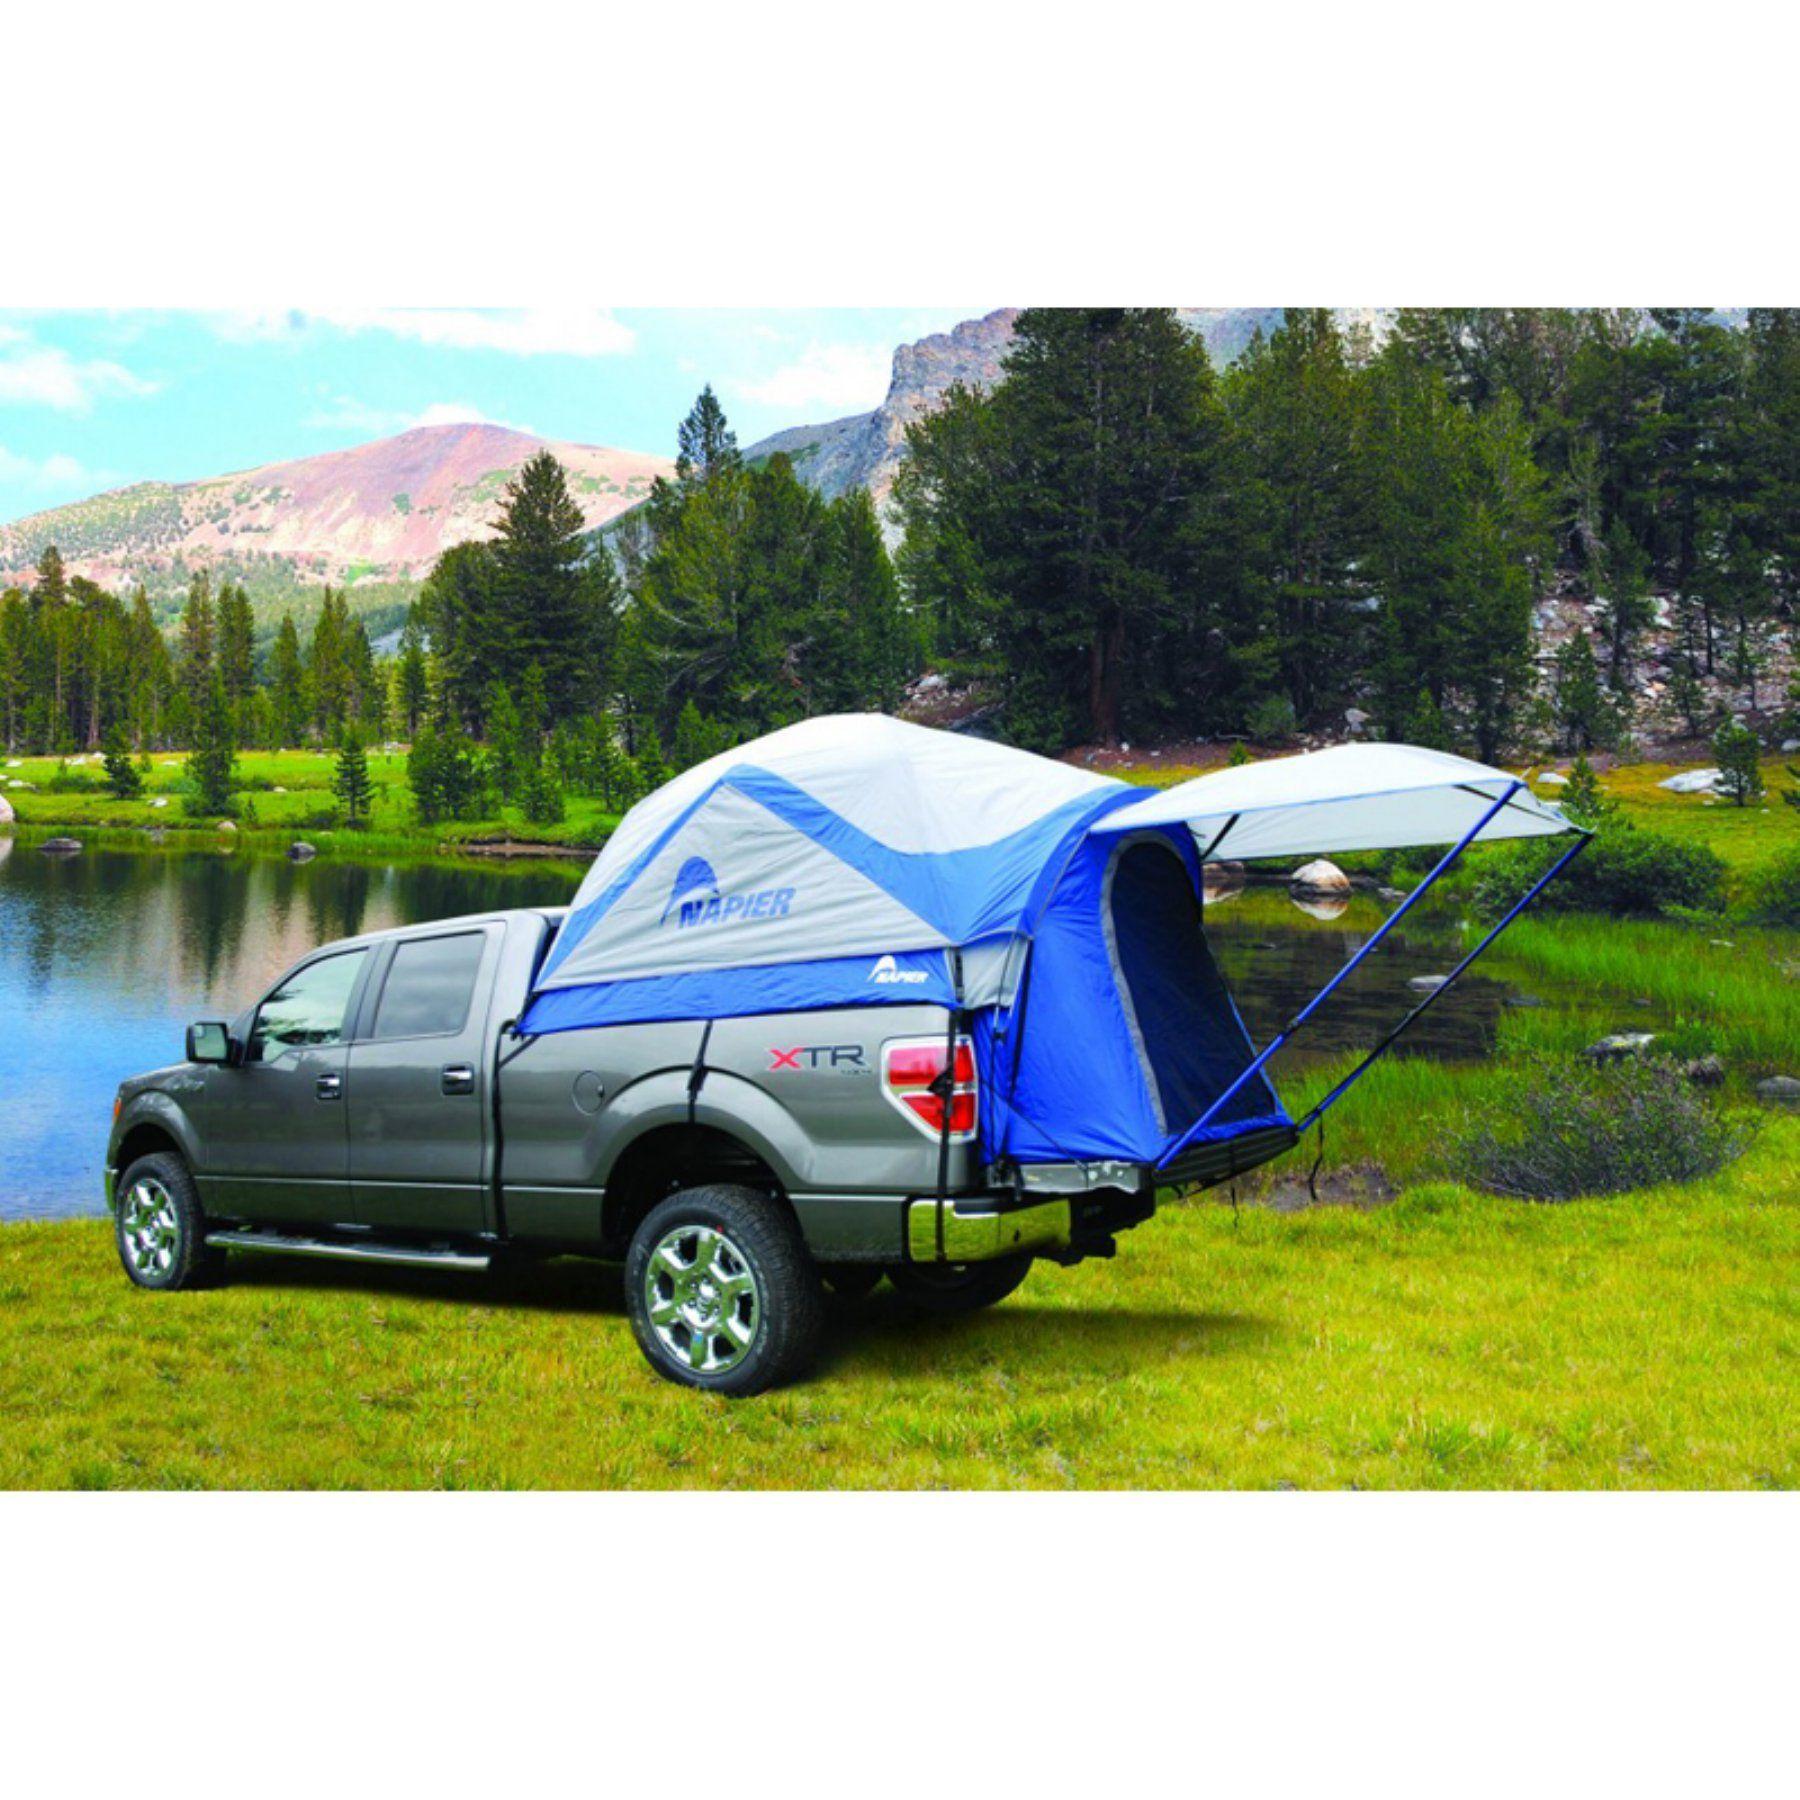 Napier Outdoors Sportz 57077 2 Person Truck Tent, Mid